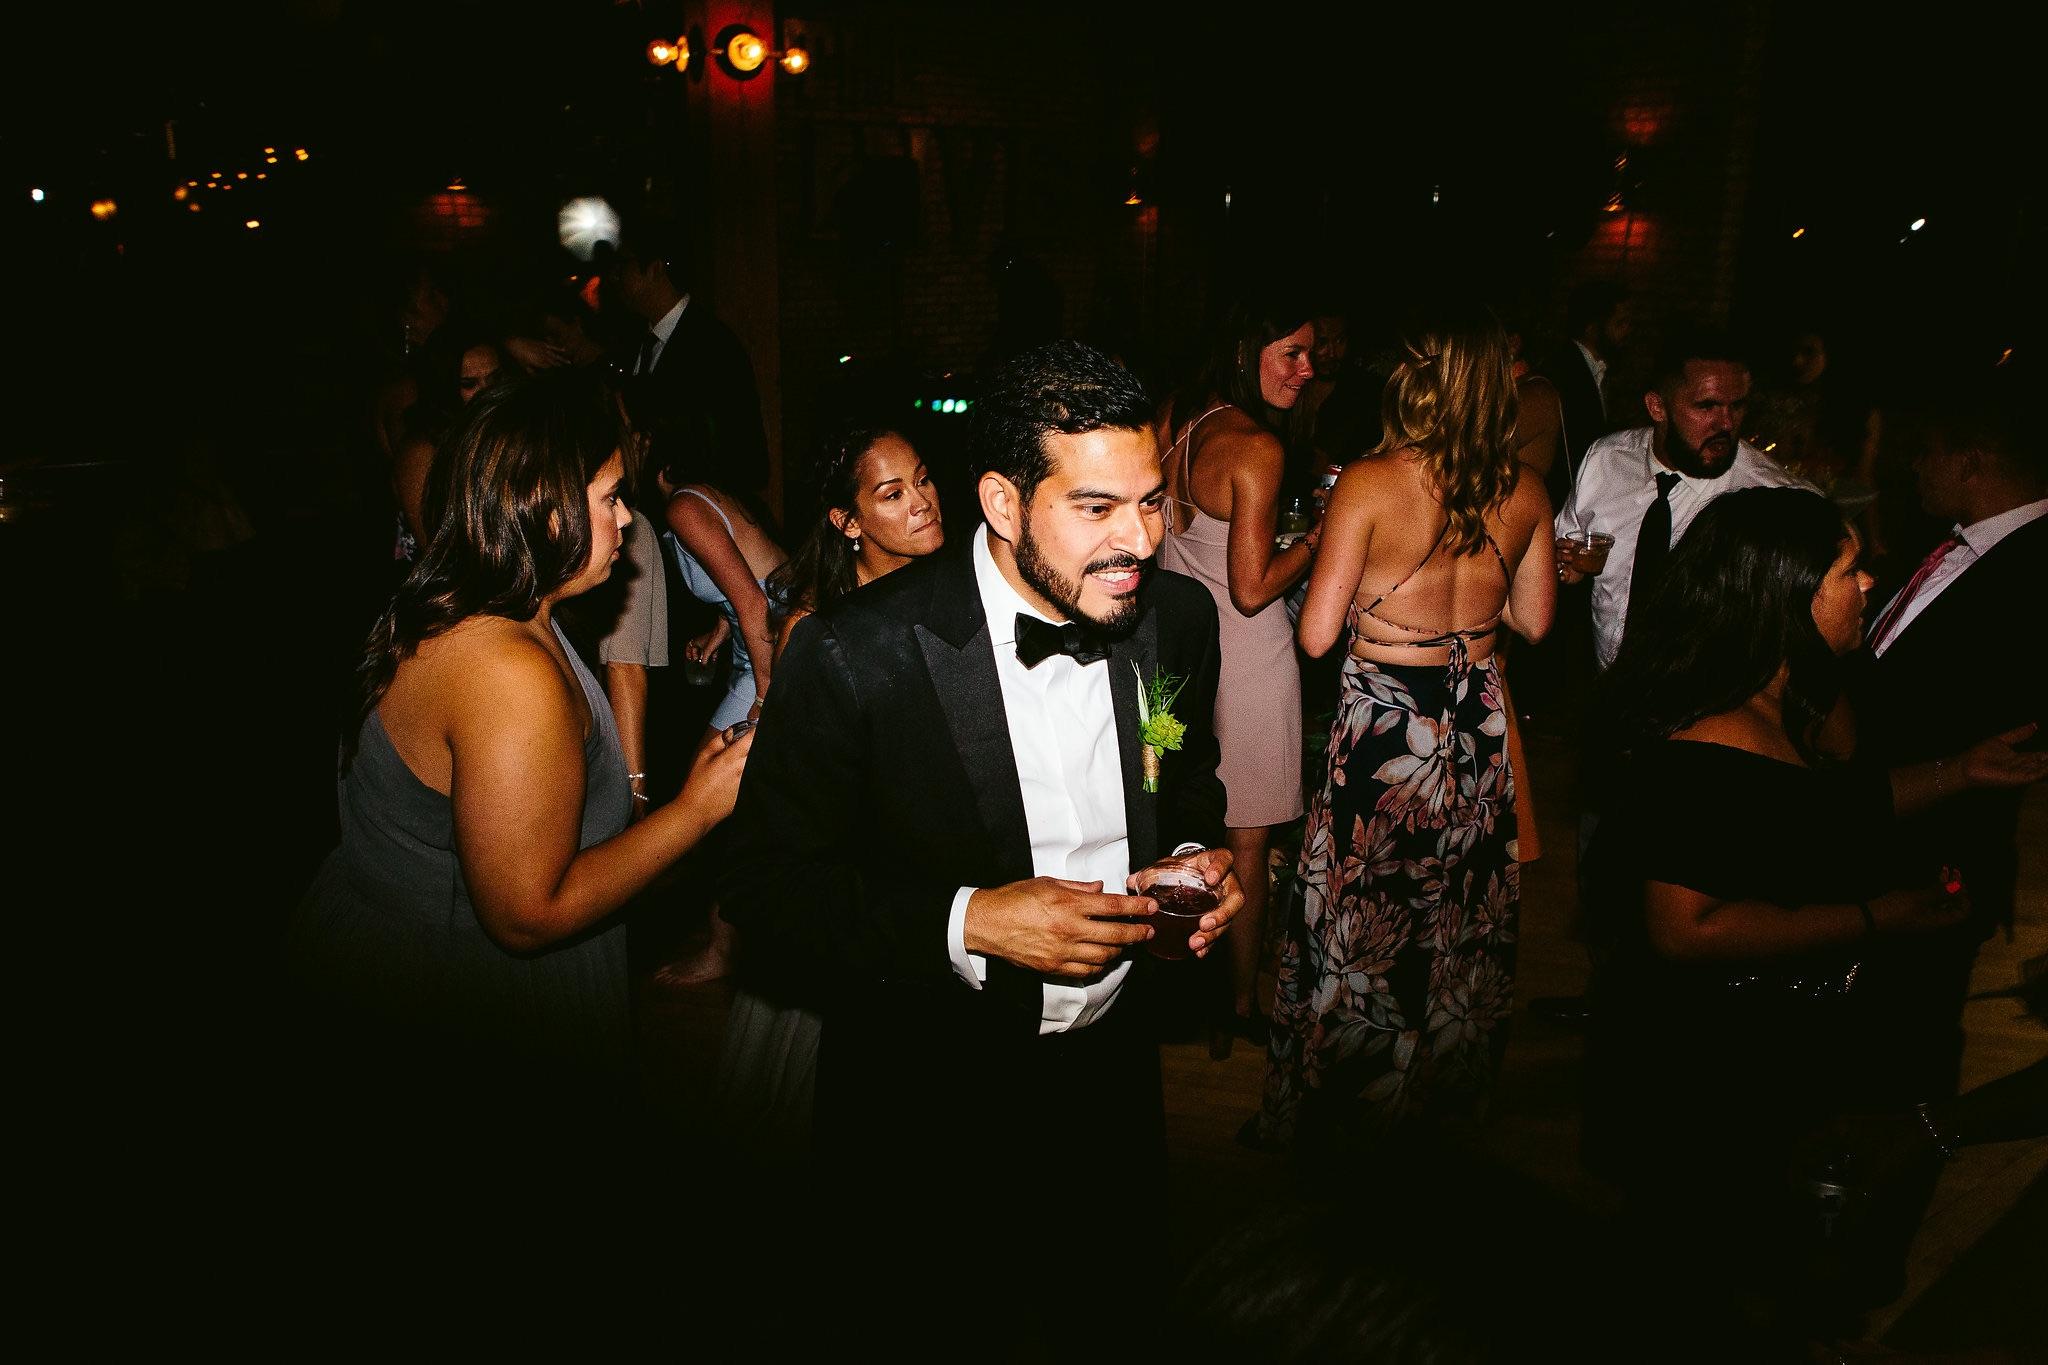 Nicodem-Creative-Wedding-Photography-Chicago-Robin-Julio-New-Leaf-DJ-Sultan-The-Hive-On-Hubbard-BHLDN-Sweet-Mandy-Bs-Cupcakes